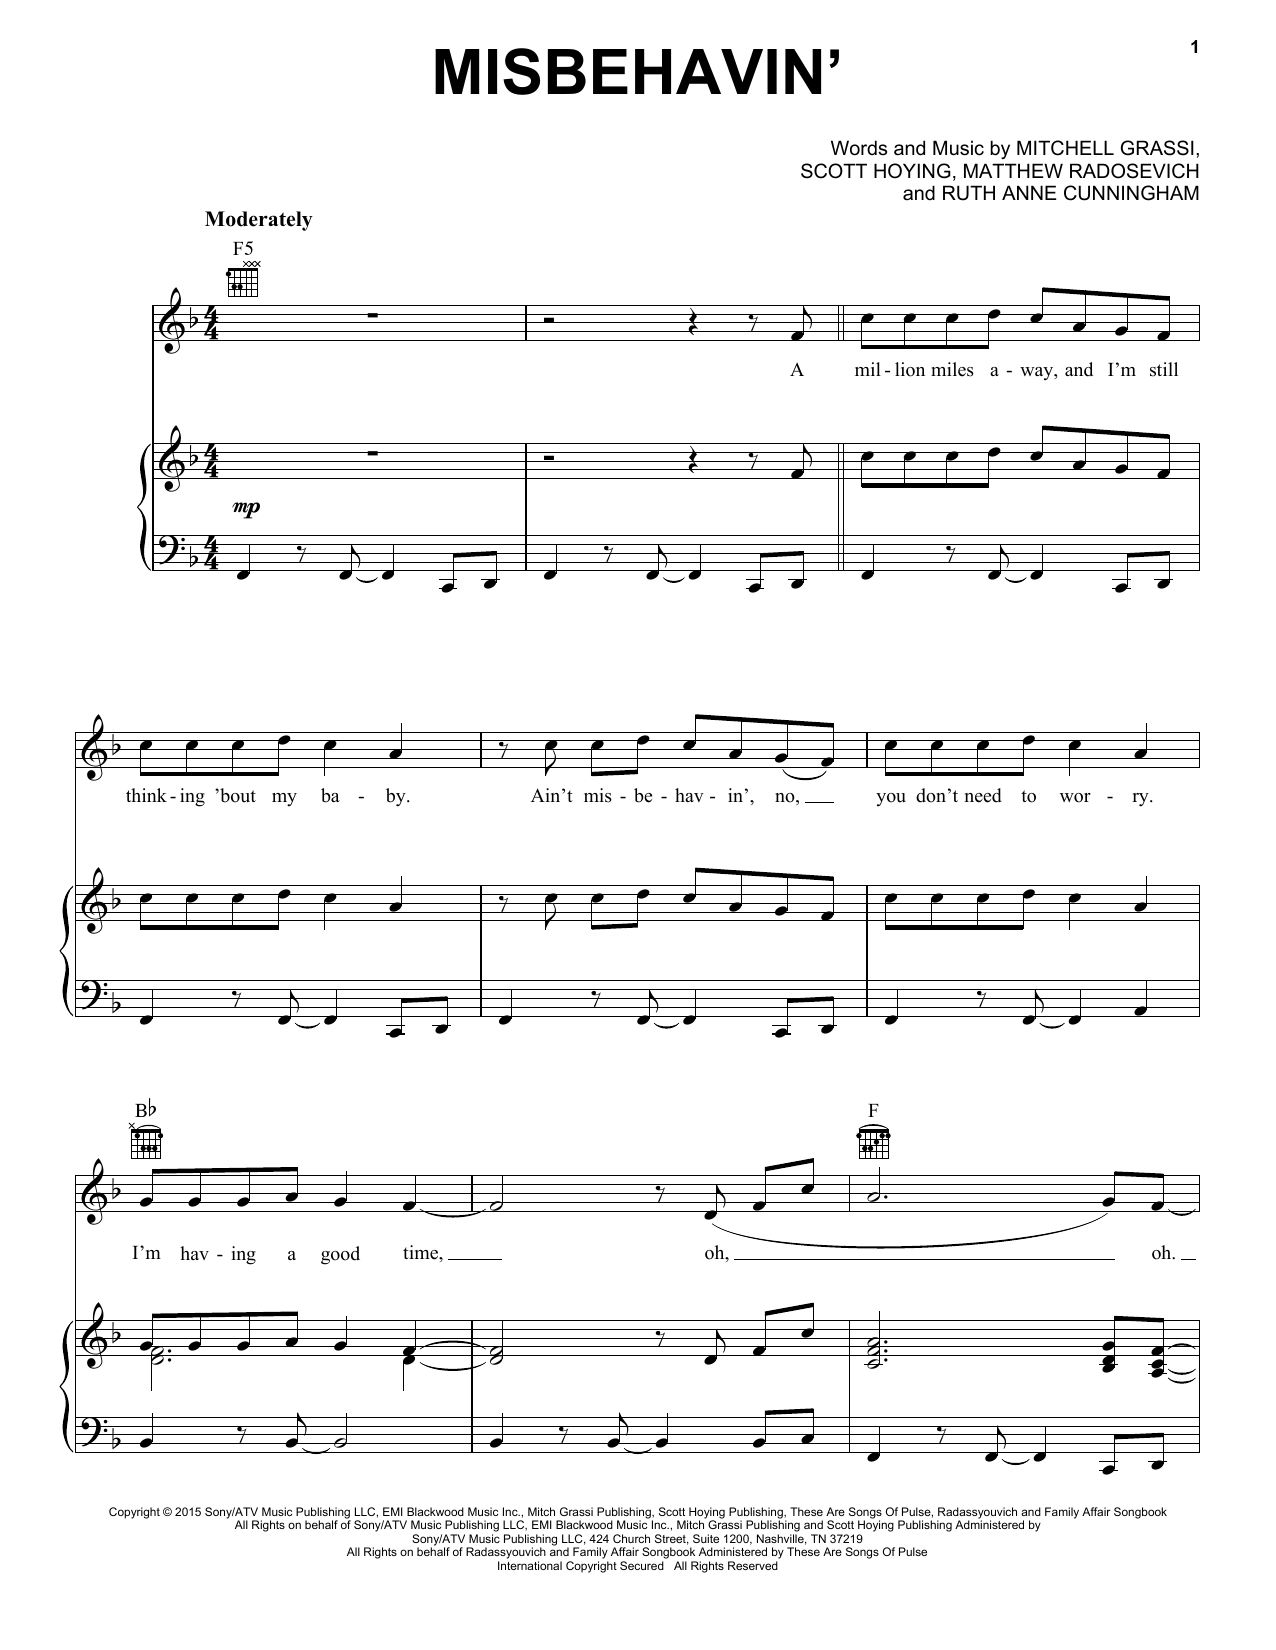 Pentatonix Misbehavin' sheet music notes and chords. Download Printable PDF.